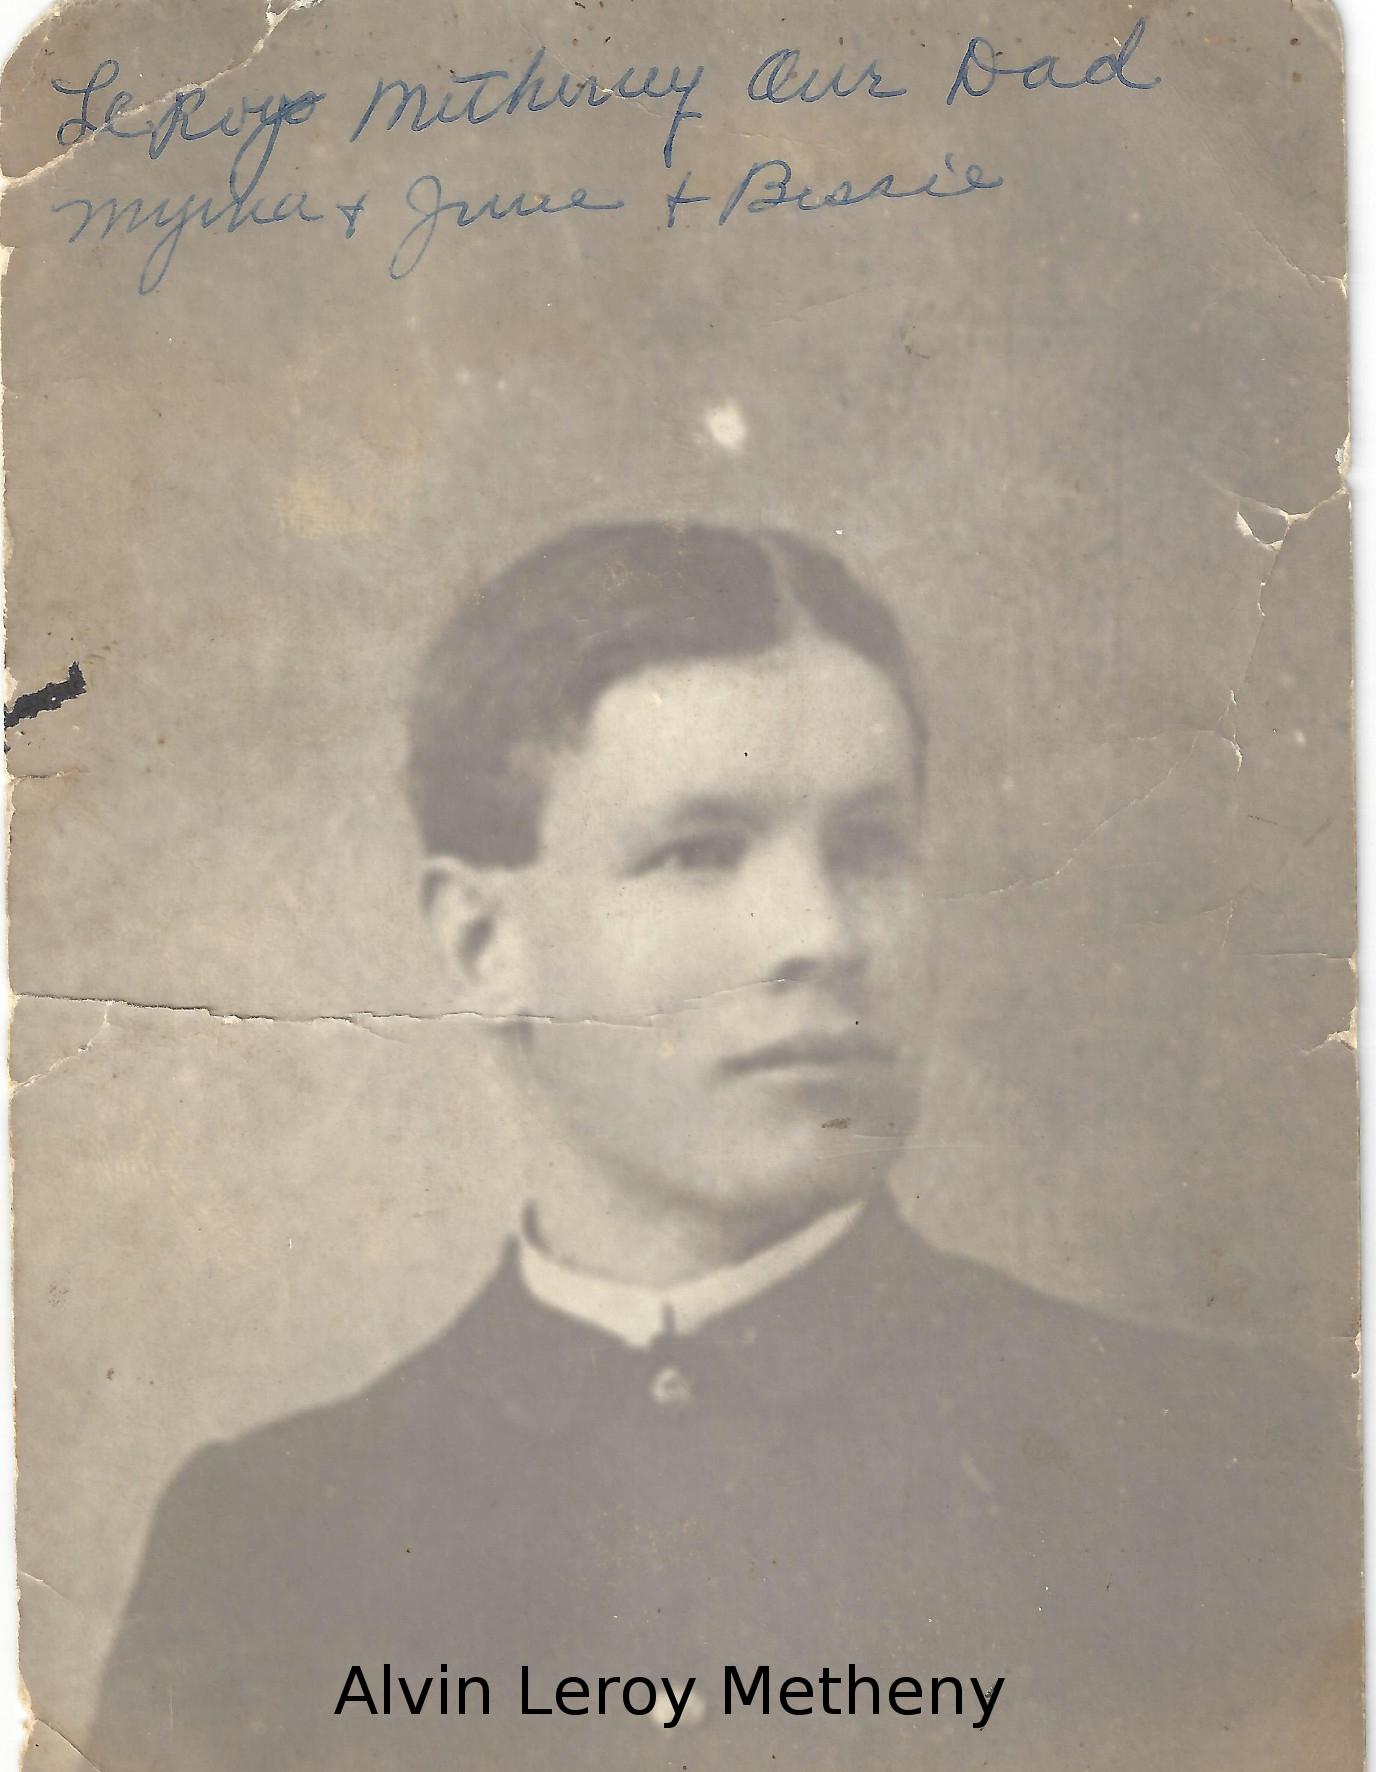 Alvin Leroy Metheny (cropped)